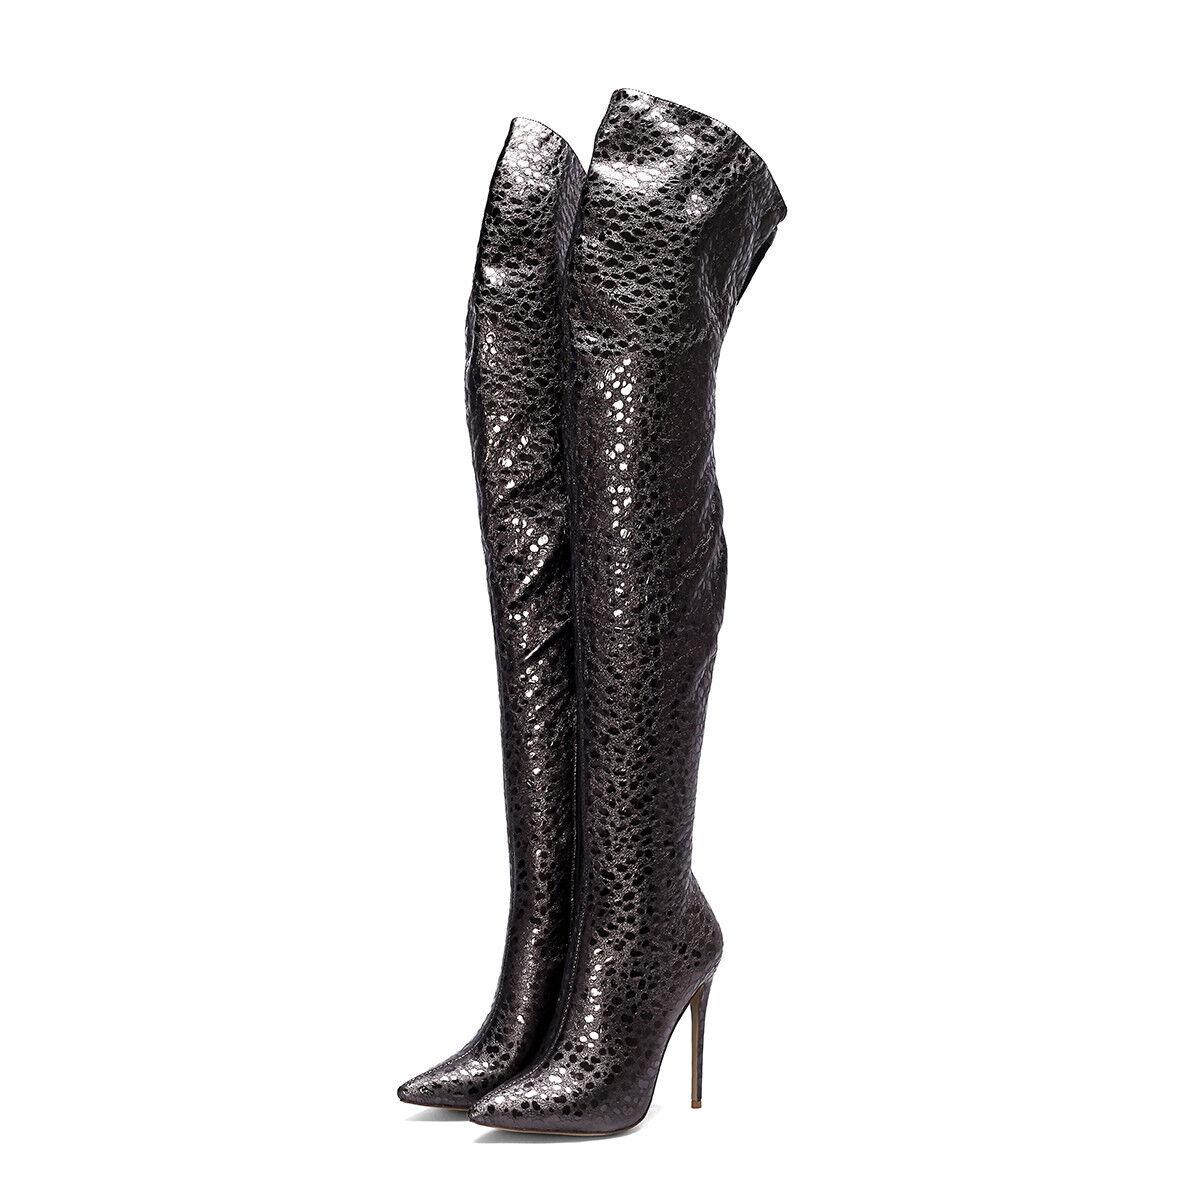 donna Over-knee High stivali High Heels Pointed Toe Fashion Club Stiletto scarpe